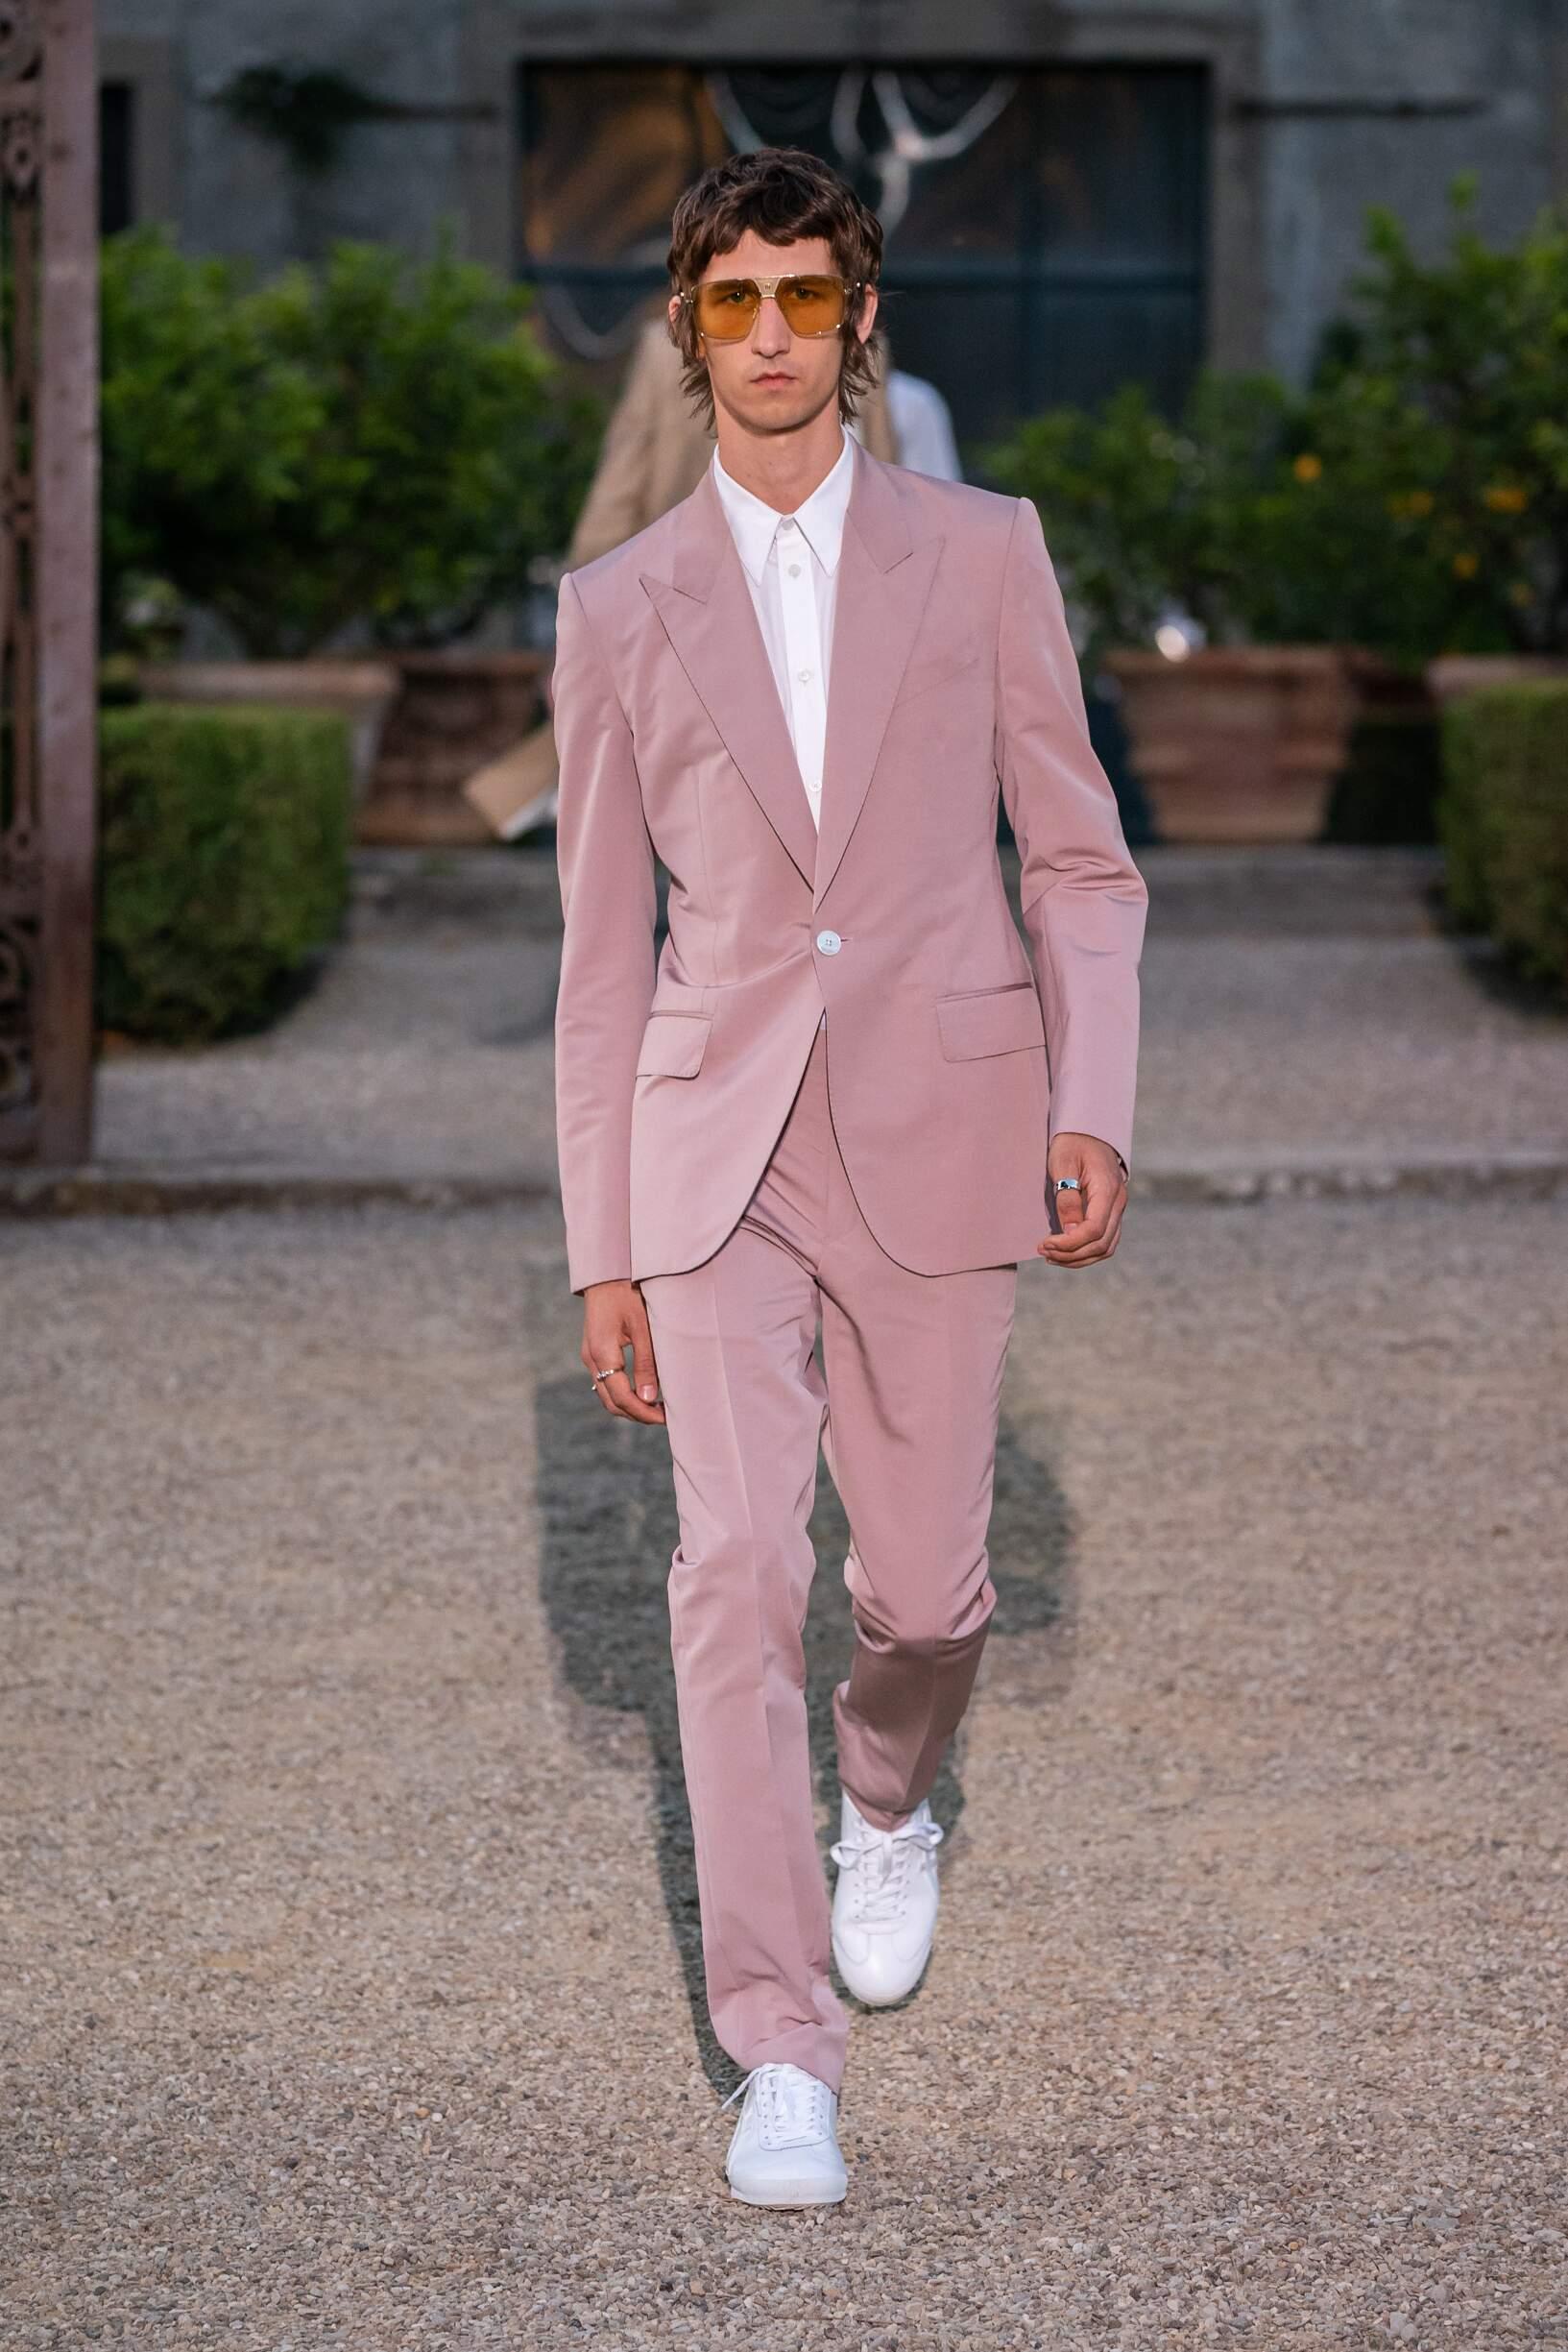 Givenchy Pitti Immagine